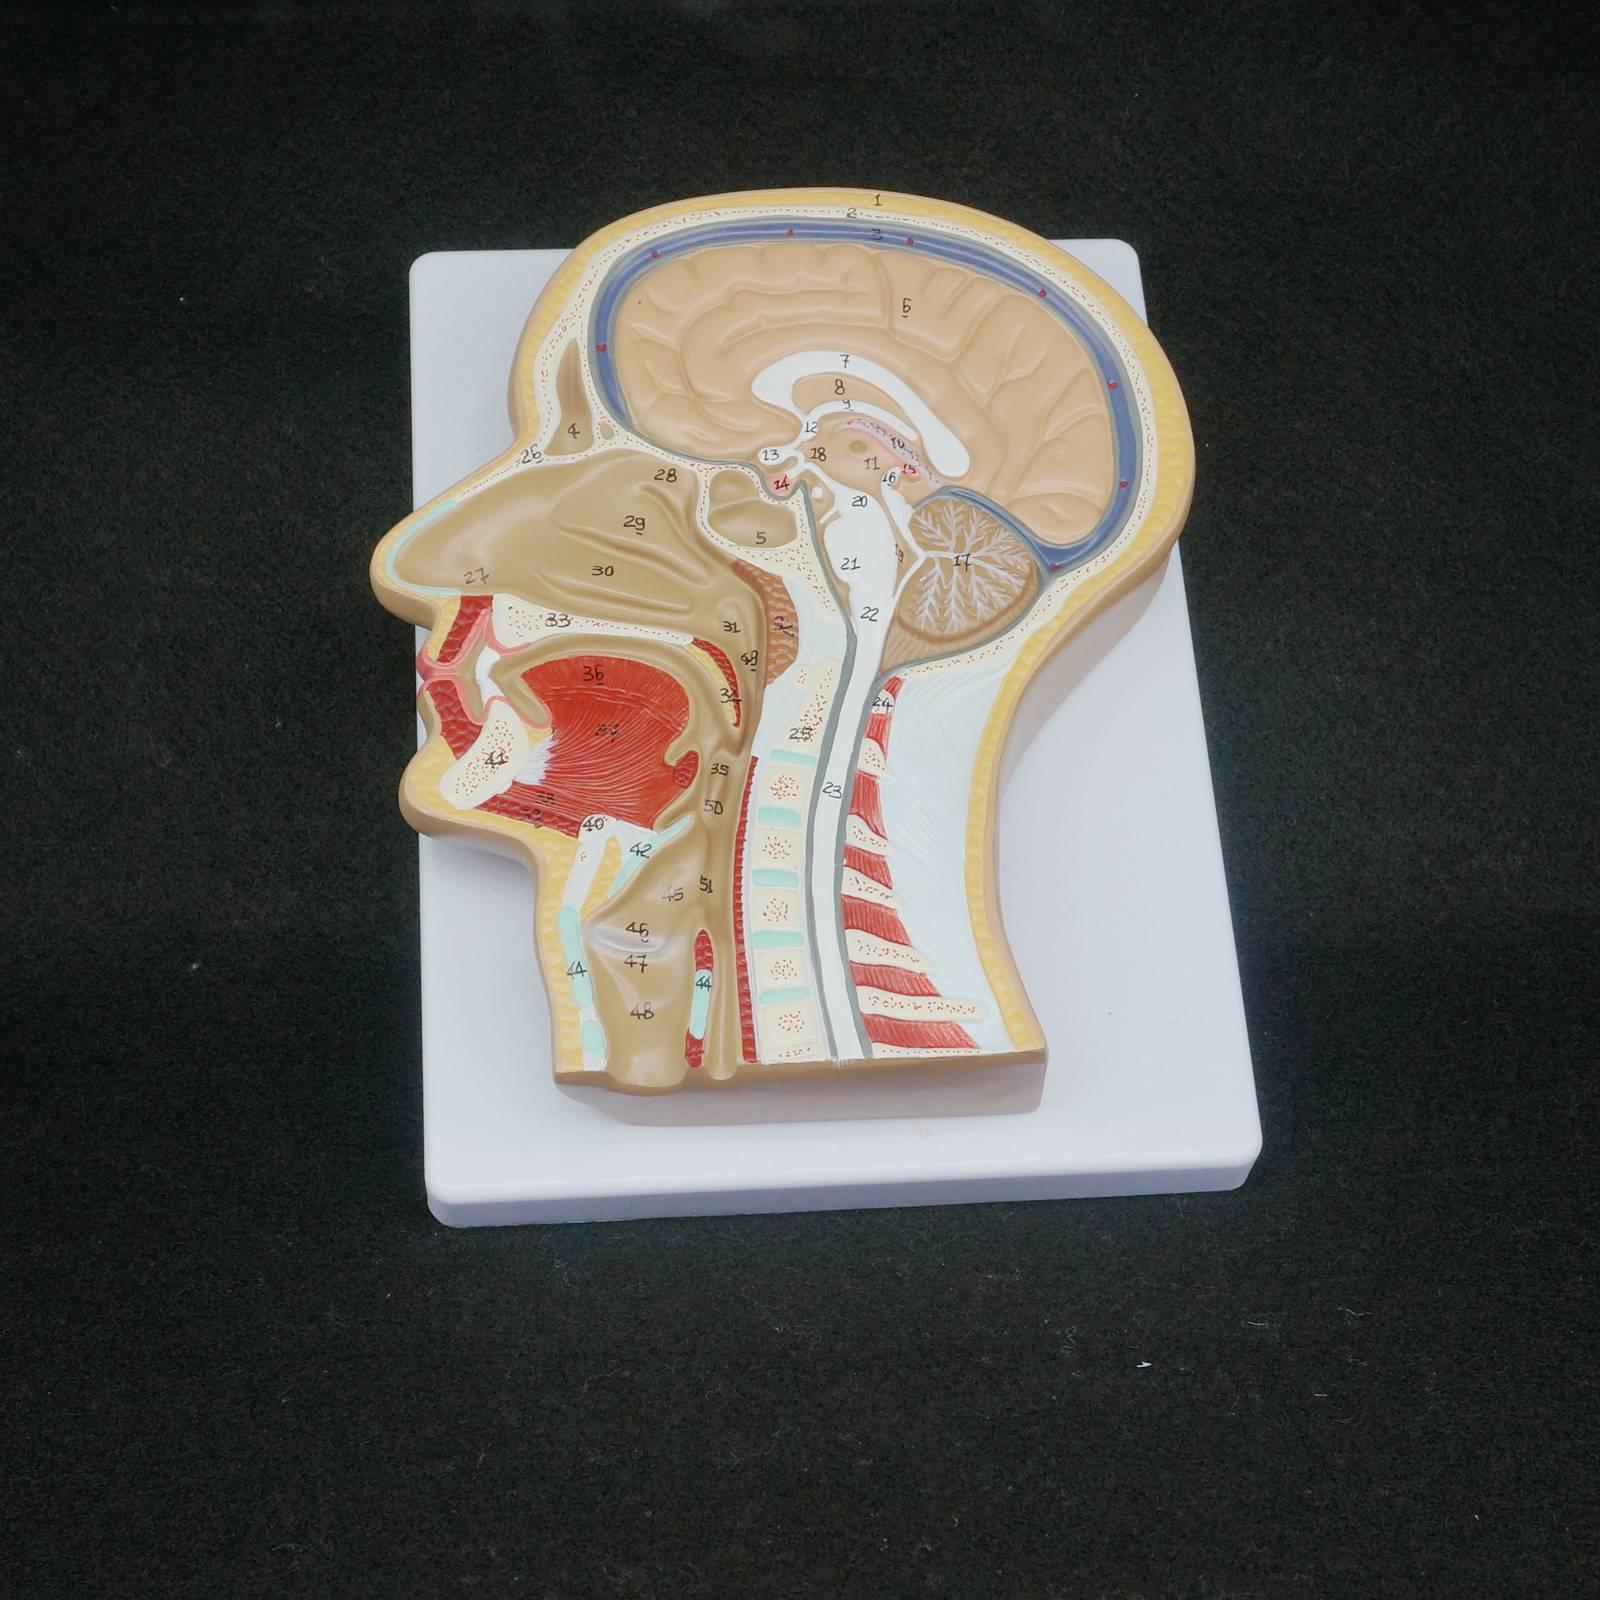 Human Median Section of Head Anatomical Model Medical Skeleton Anatomy Digital Identification